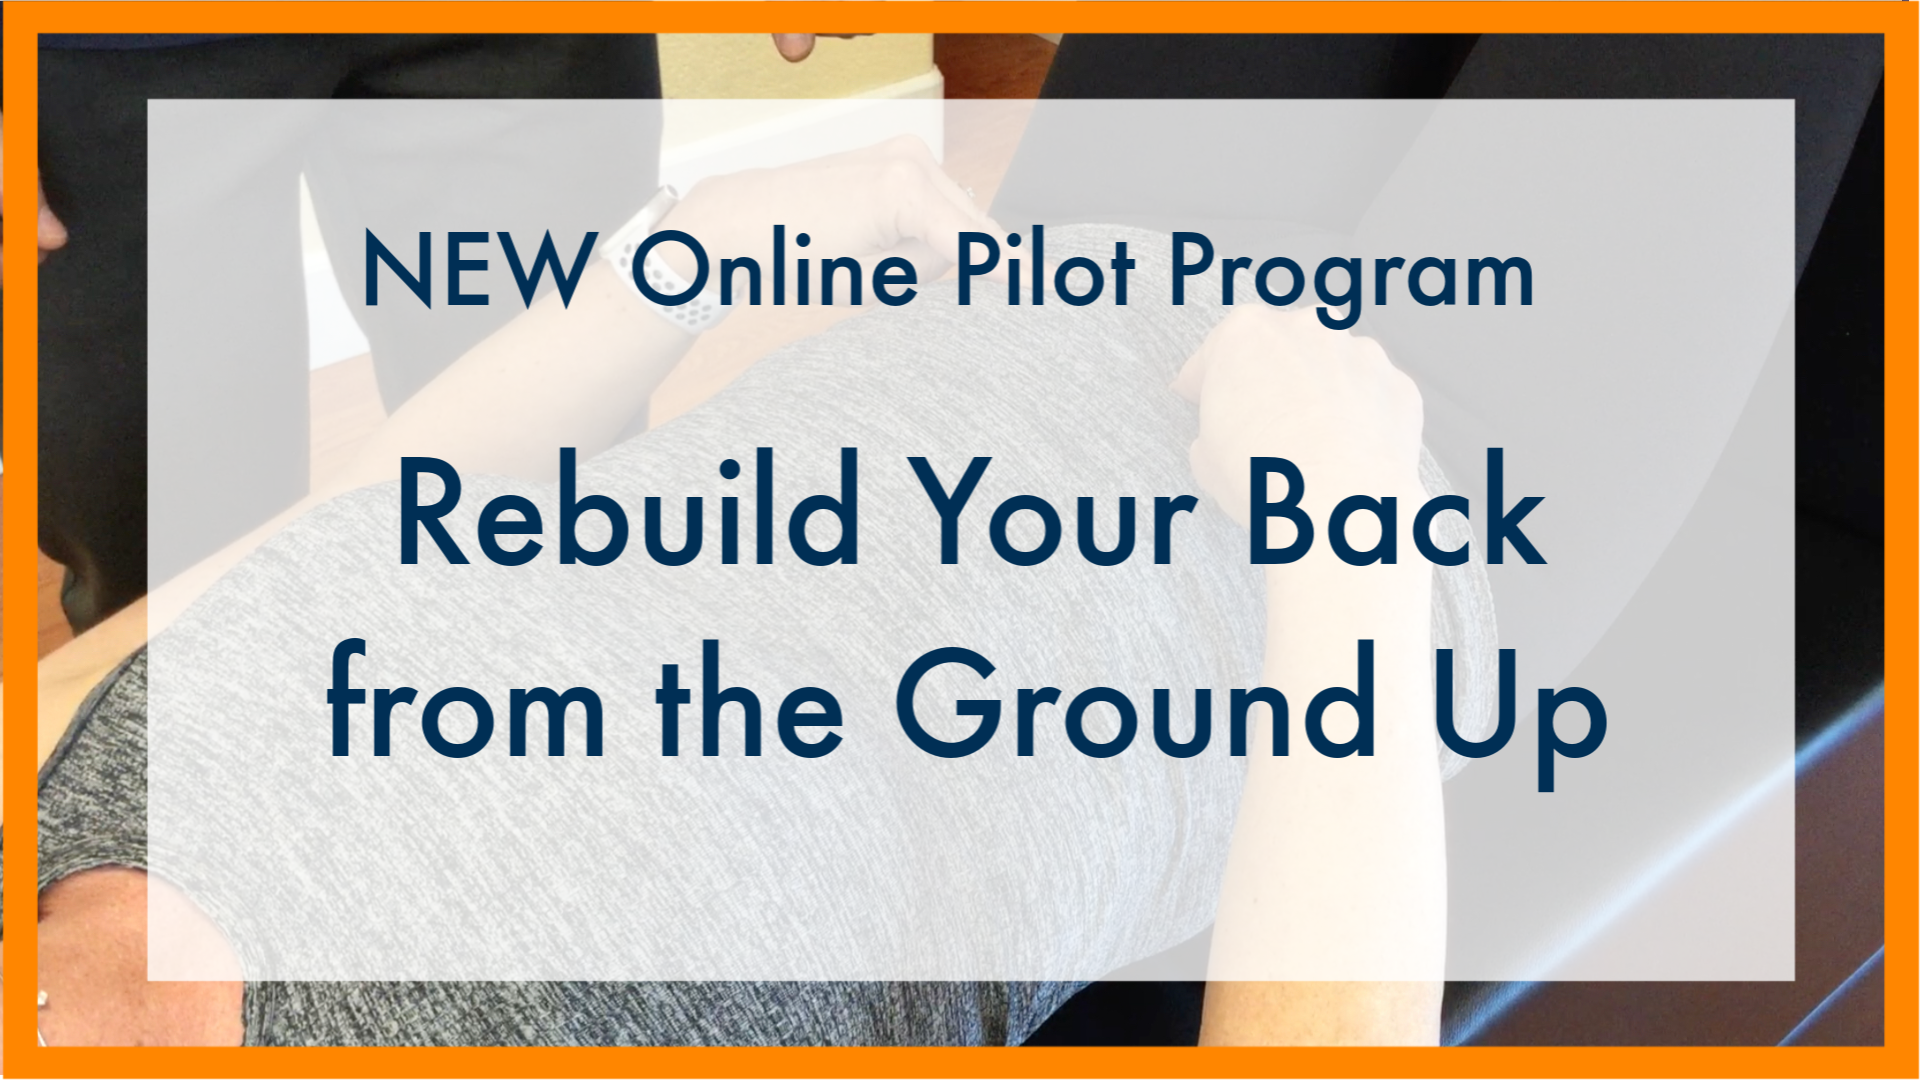 Rebuild your back cover for flyer (1).png